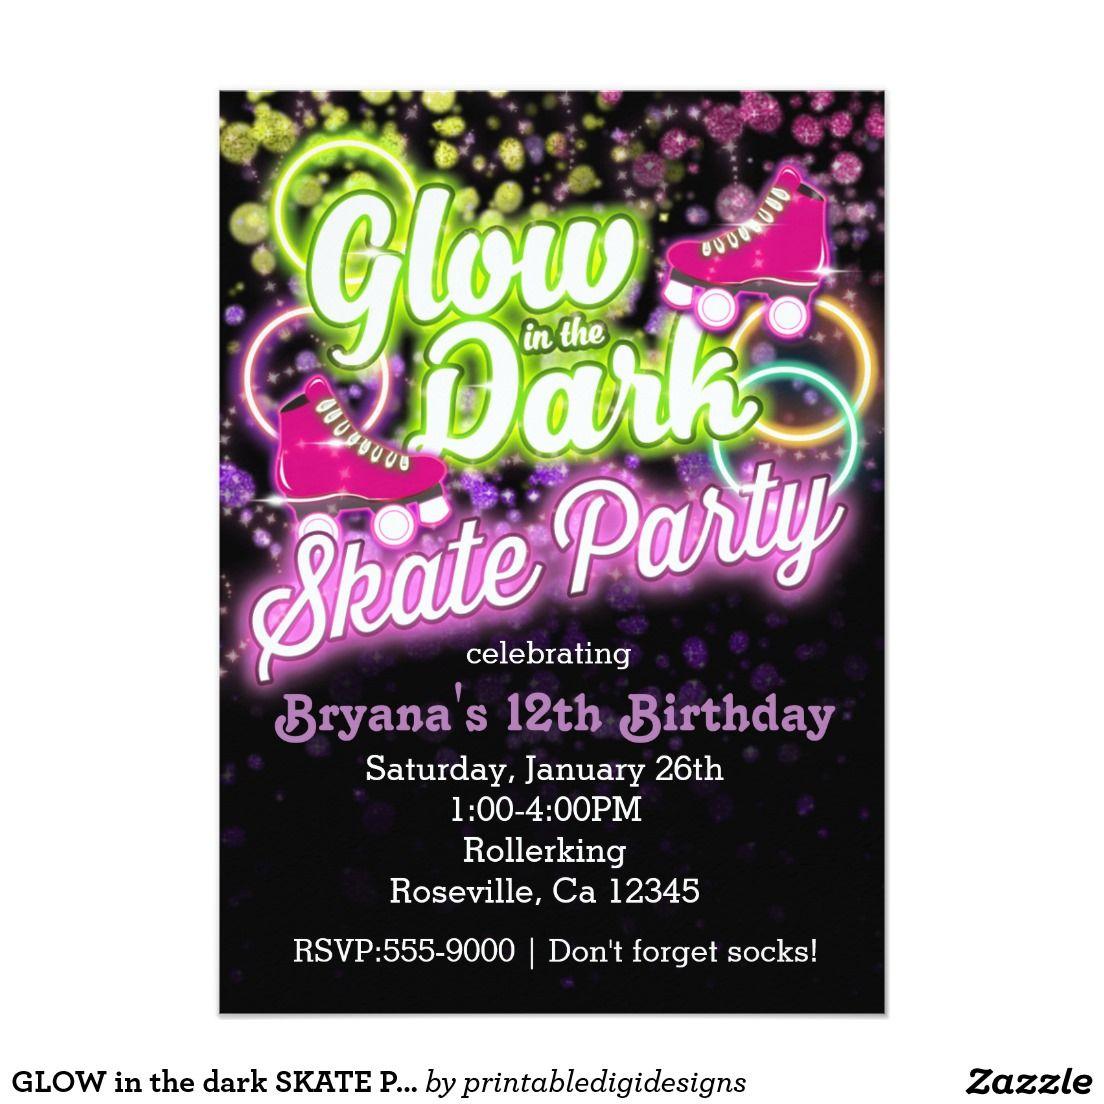 Glow In The Dark Skate Party Birthday Invitation   Party Invitations - Free Printable Glow In The Dark Birthday Party Invitations